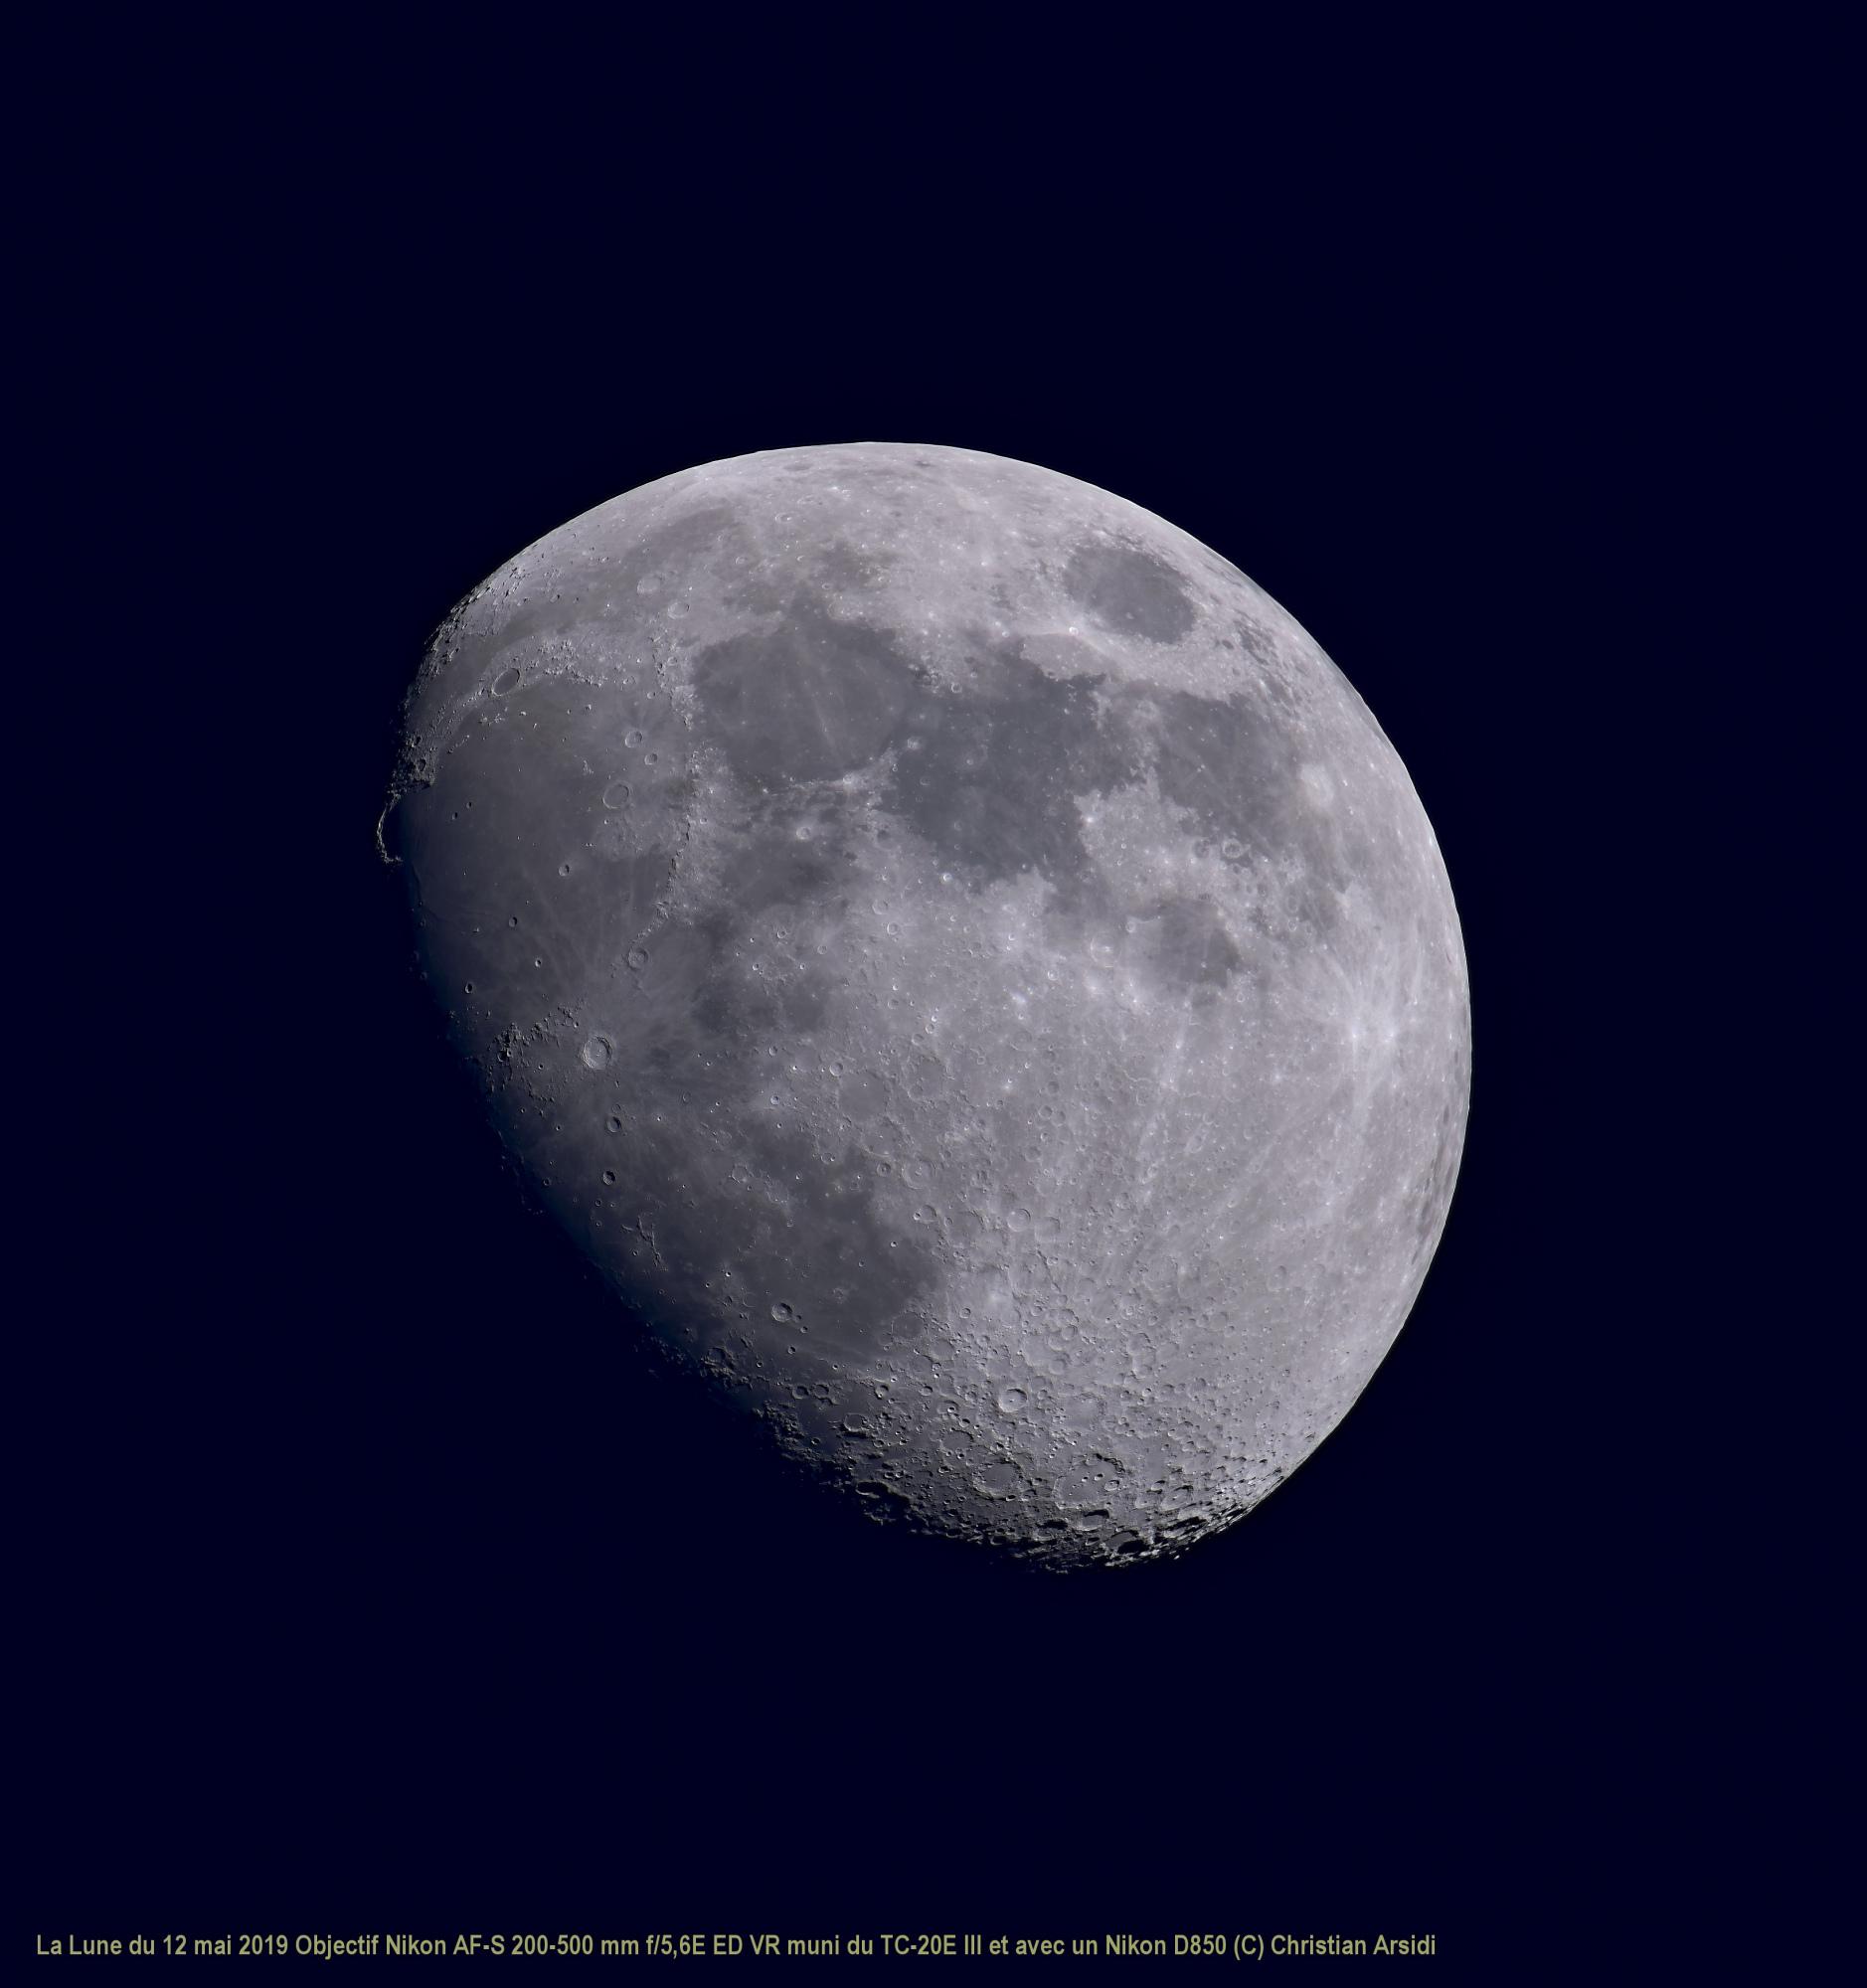 La Lune 35 images BV 100% JPEG.jpg